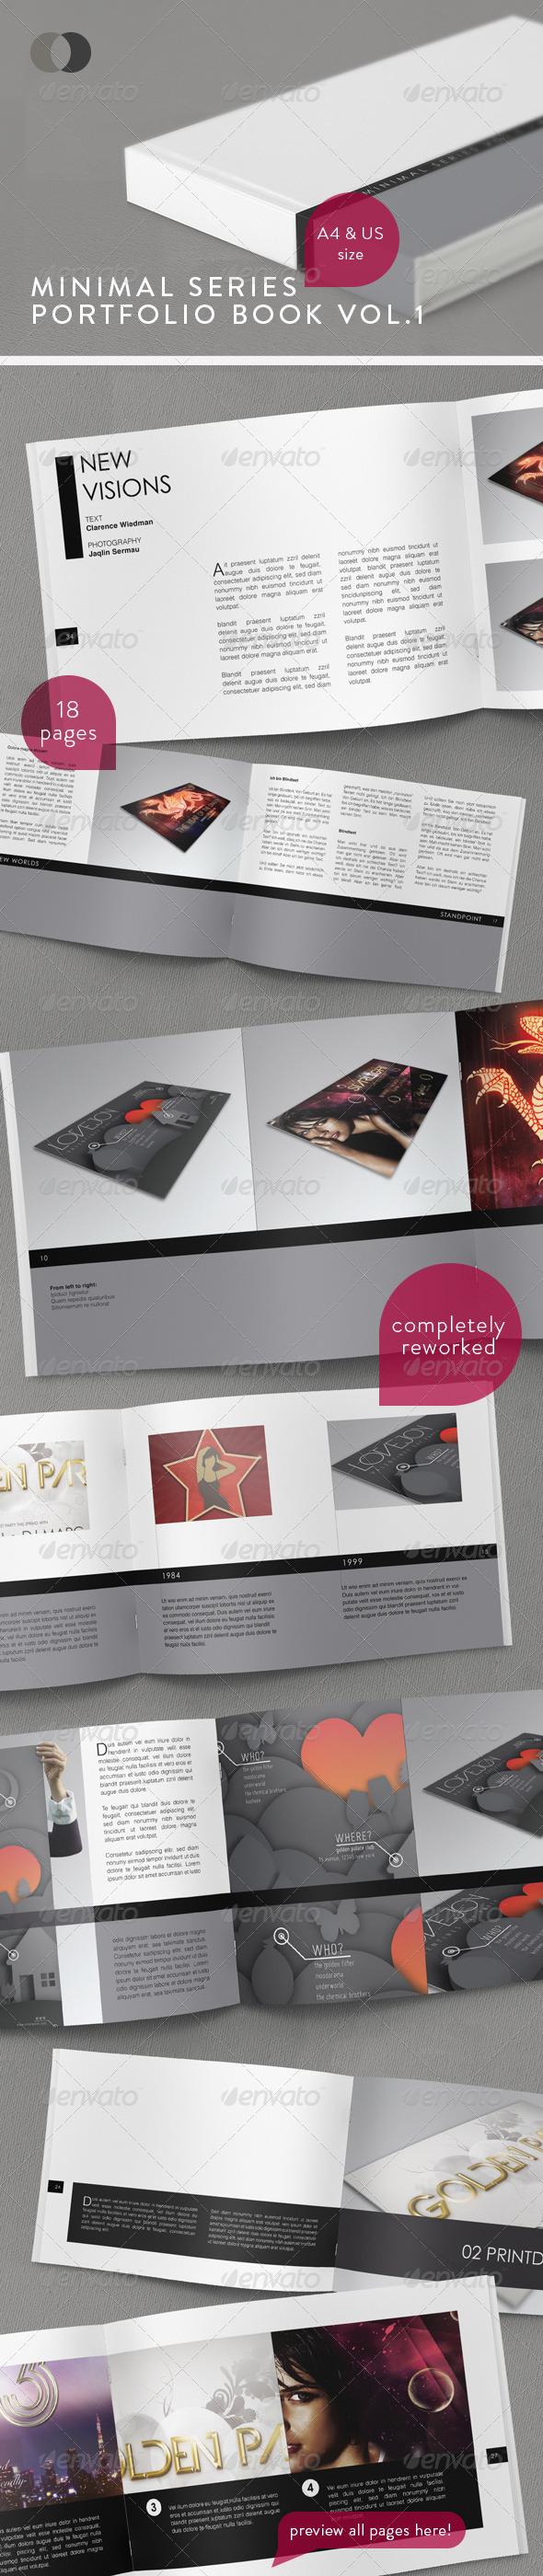 GraphicRiver Book & Brochure minimal Series Vol.1 158287